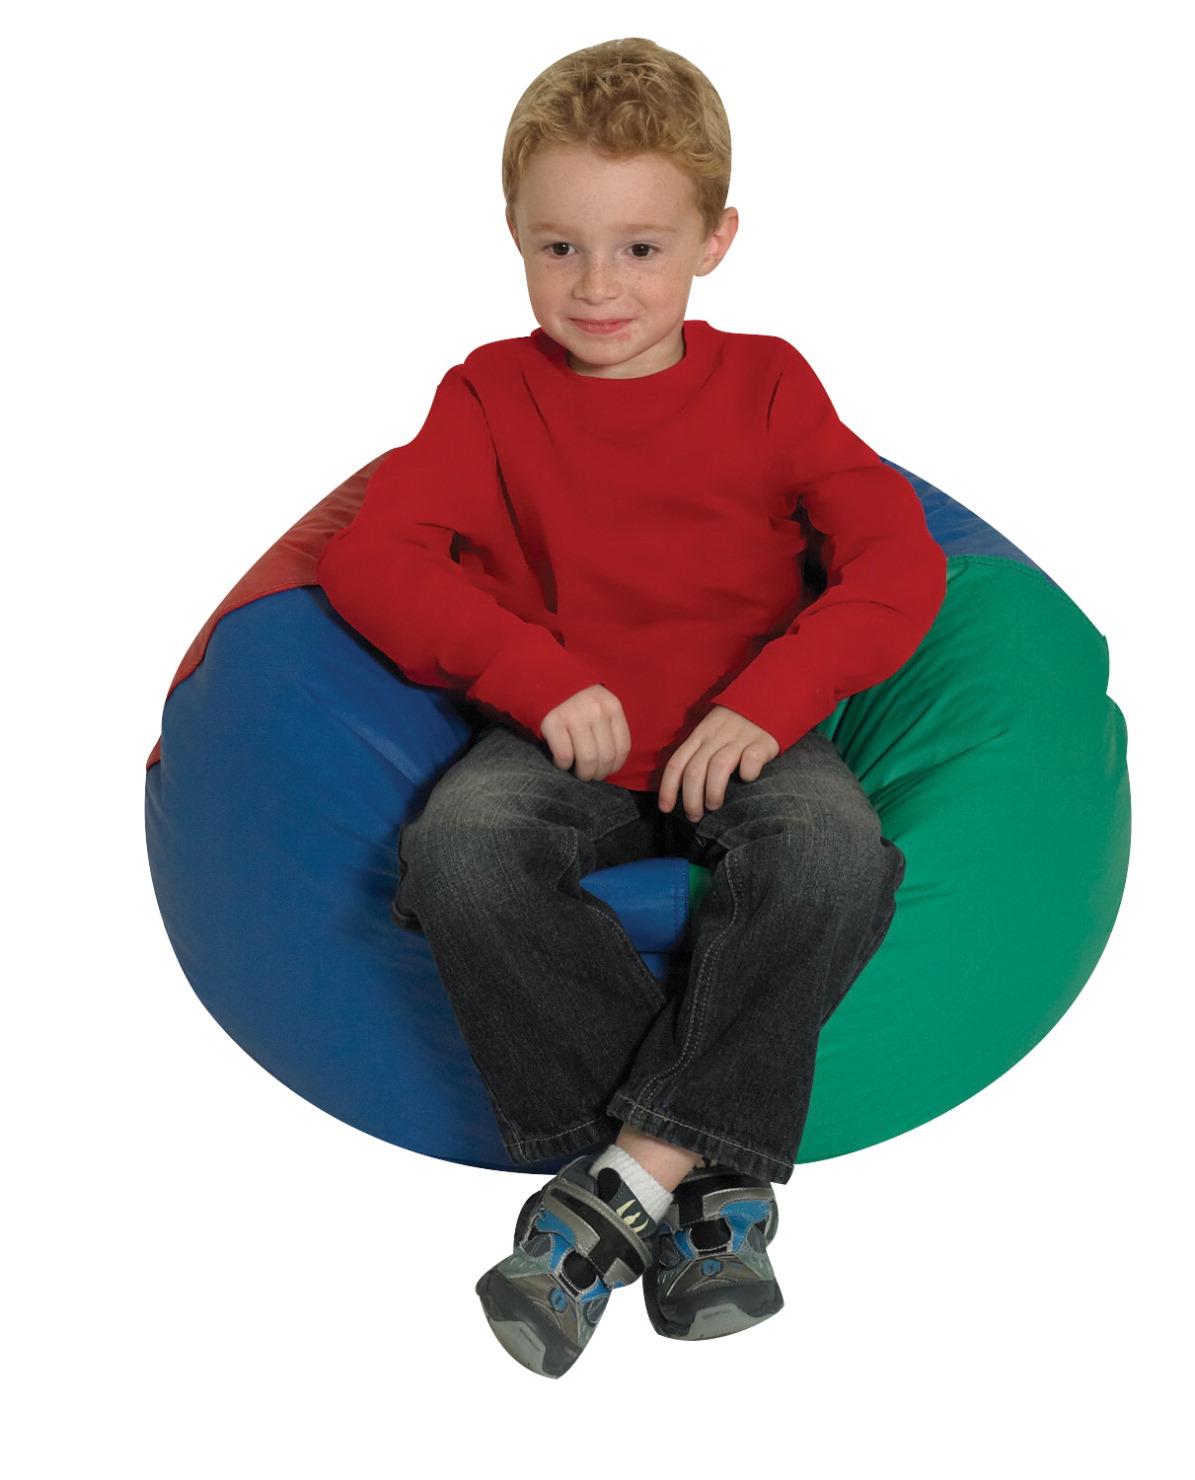 Children's Factory Premium Beanbag Chair, 26 in Dia, Vinyl, Green - Beanbag Chair - SCHOOL SPECIALTY MARKETPLACE